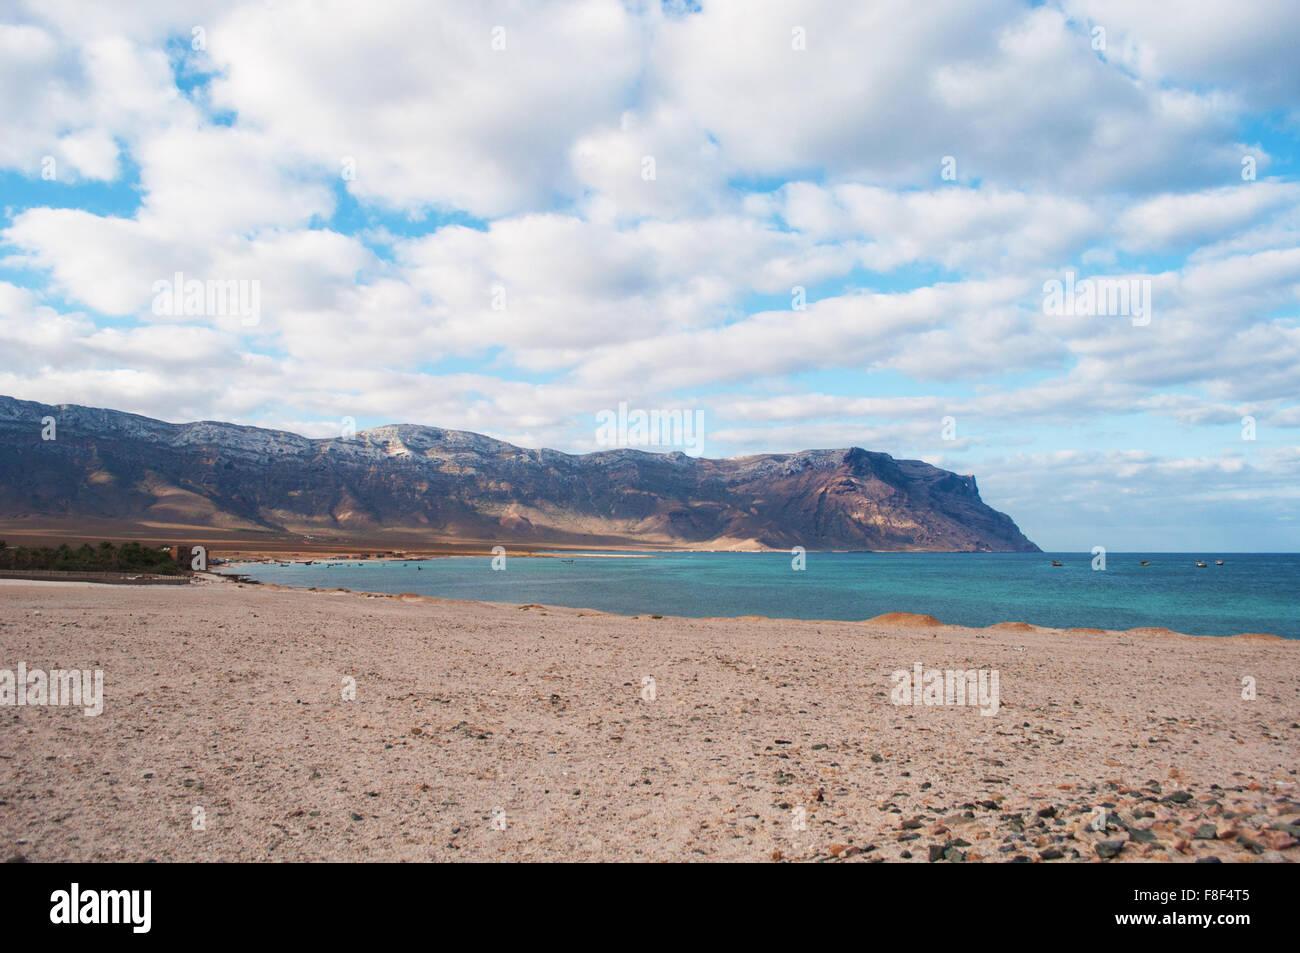 The protected area of Ras Shuab,  Shuab Bay beach, Gulf of Aden, Arabian Sea, Socotra Island, Yemen, Middle East. - Stock Image